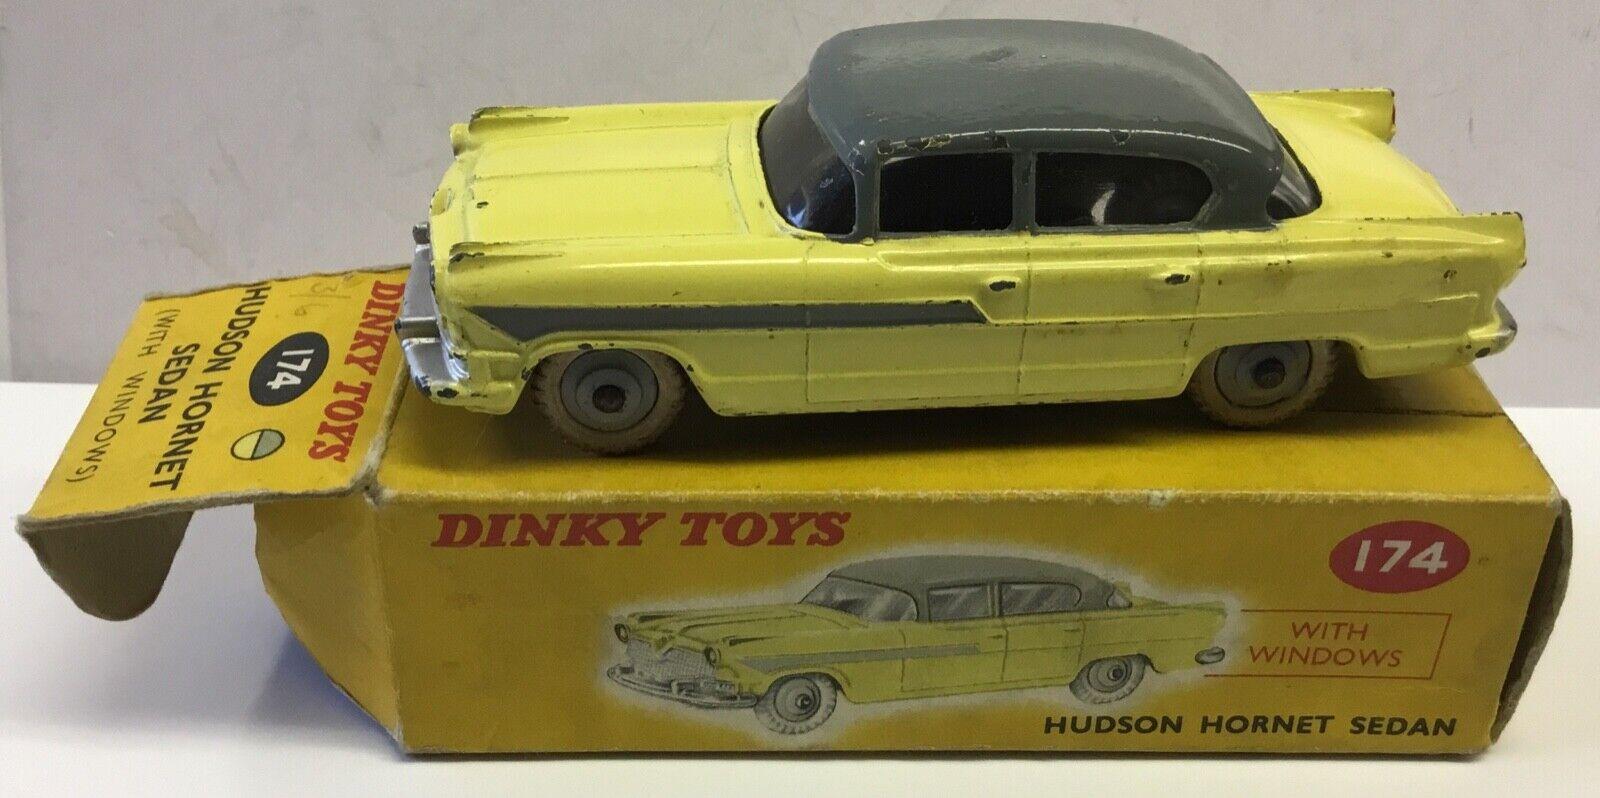 DINKY TOYS 174 HUDSON HORNET SEDAN WITH ORIGINAL BOX.MILD WEAR TO BOTH